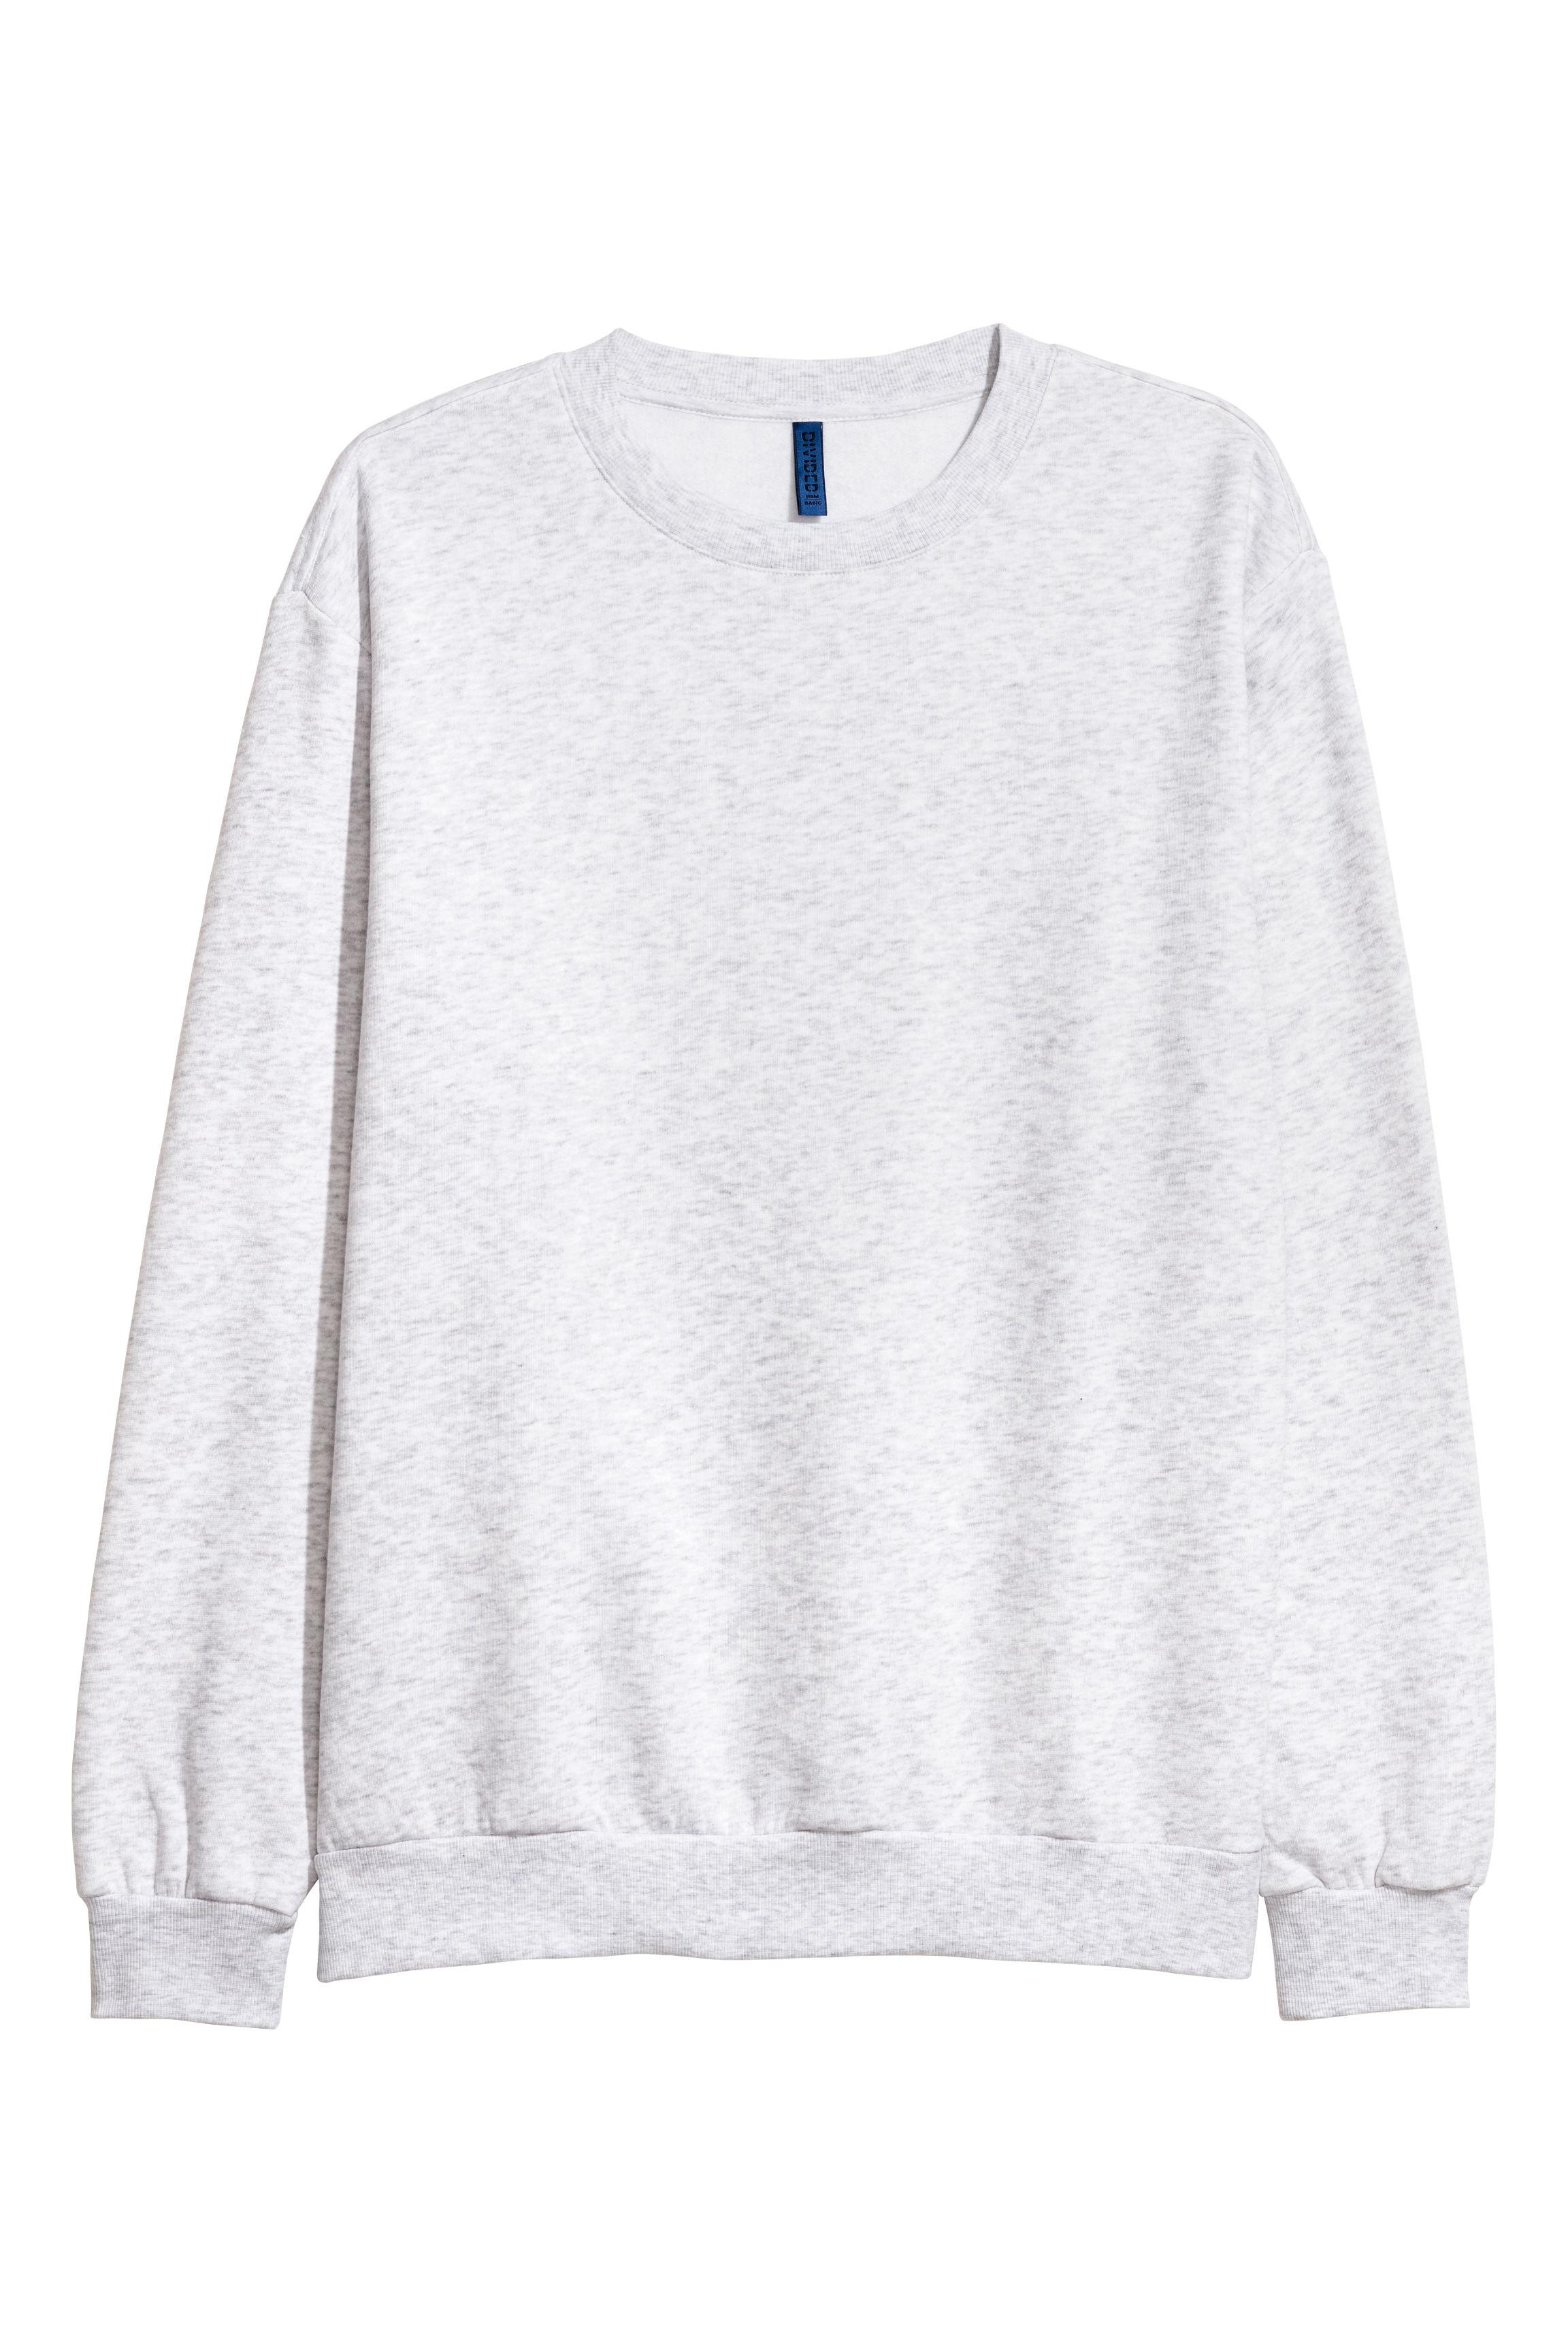 Oversized Sweatshirt - Gray melange - Men | H&M US